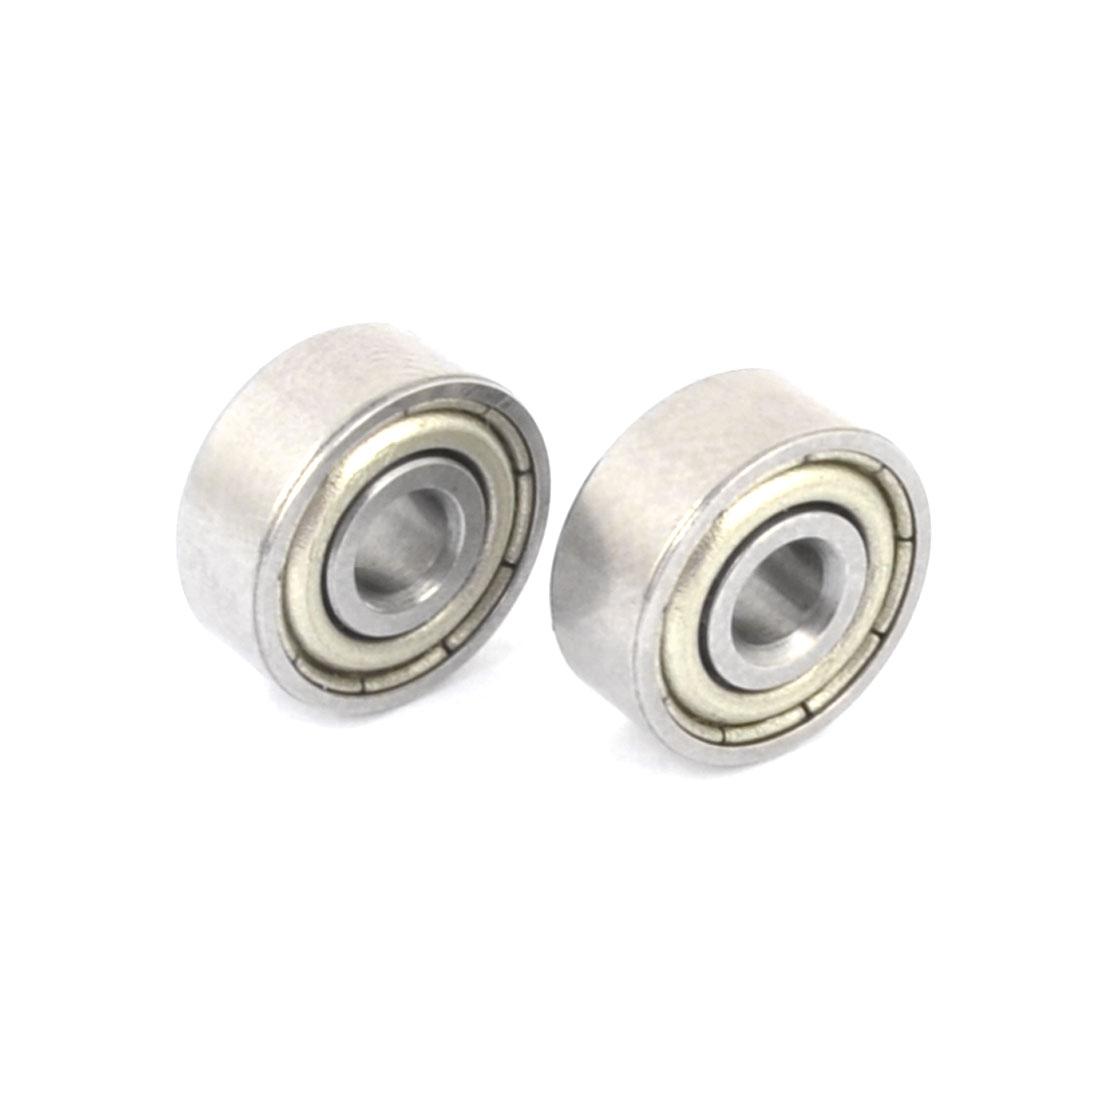 2 Pcs 623Z 3mm x 10mm x 4mm Single Row Sealed Deep Groove Ball Bearings